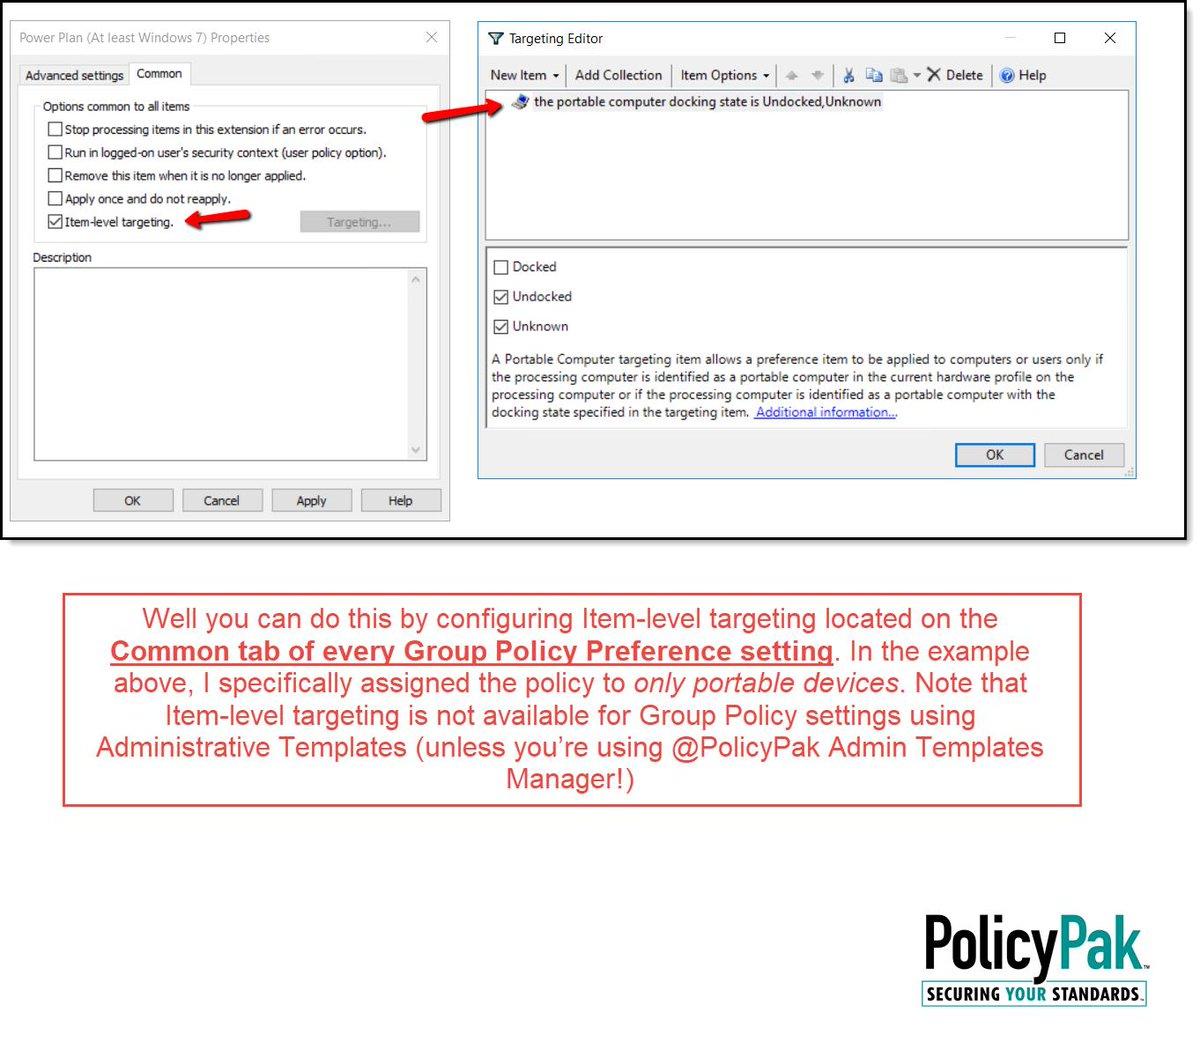 PolicyPak on Twitter: